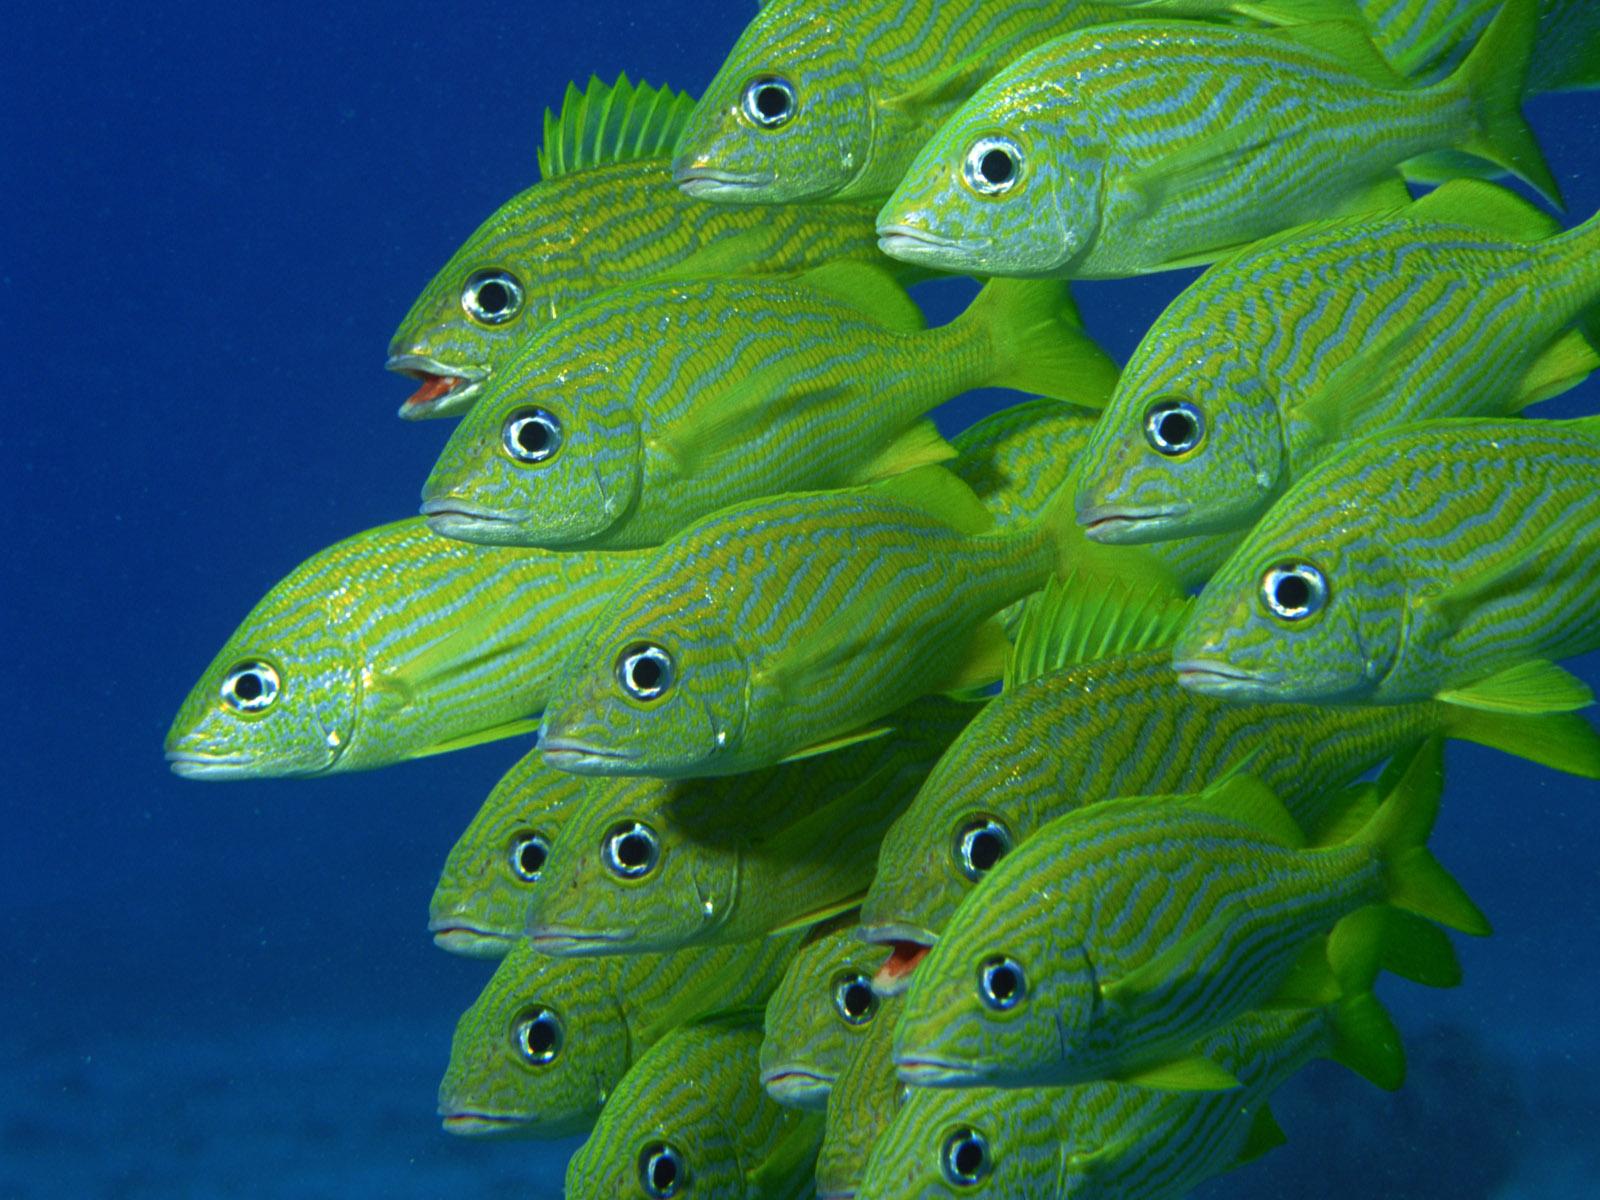 Download Fish Wallpapers wallpaper green fish wallpaper 1600x1200